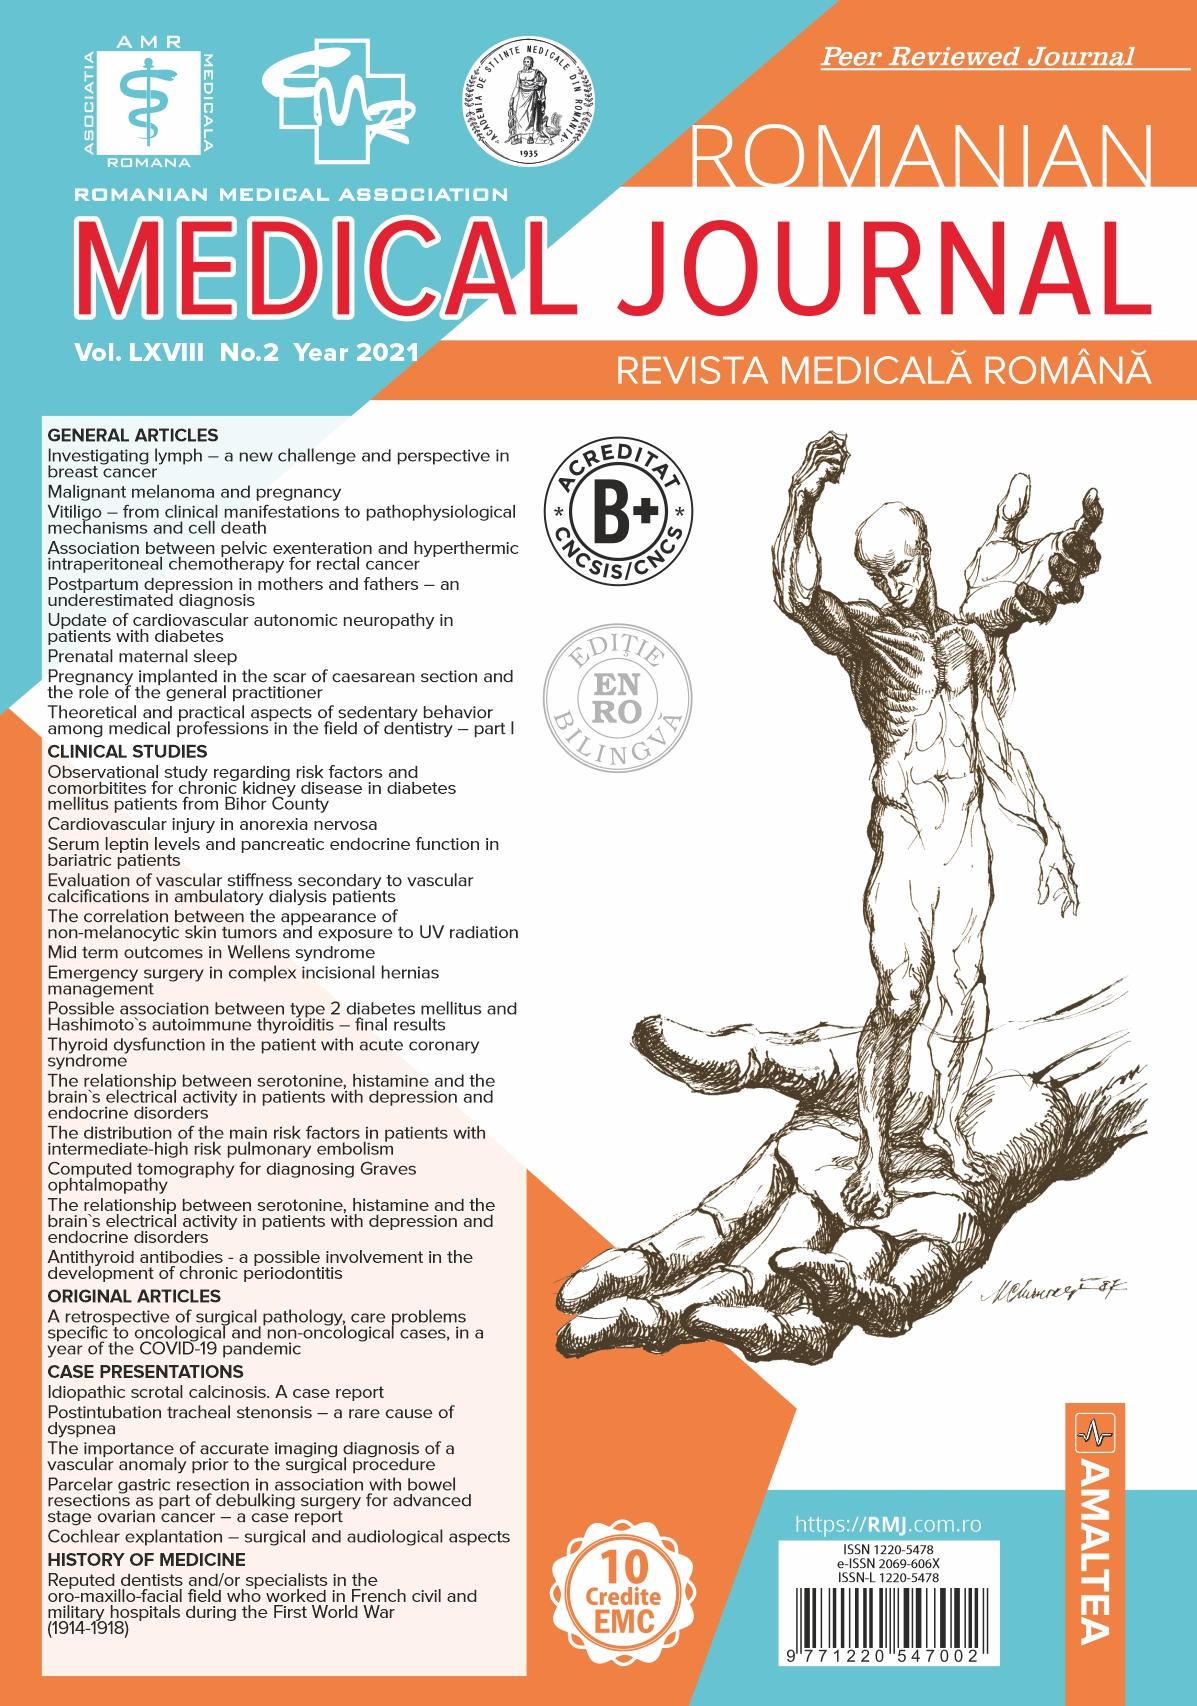 ROMANIAN MEDICAL JOURNAL - Revista Medicala Romana, Vol. LXVIII, No. 2, Year 2021